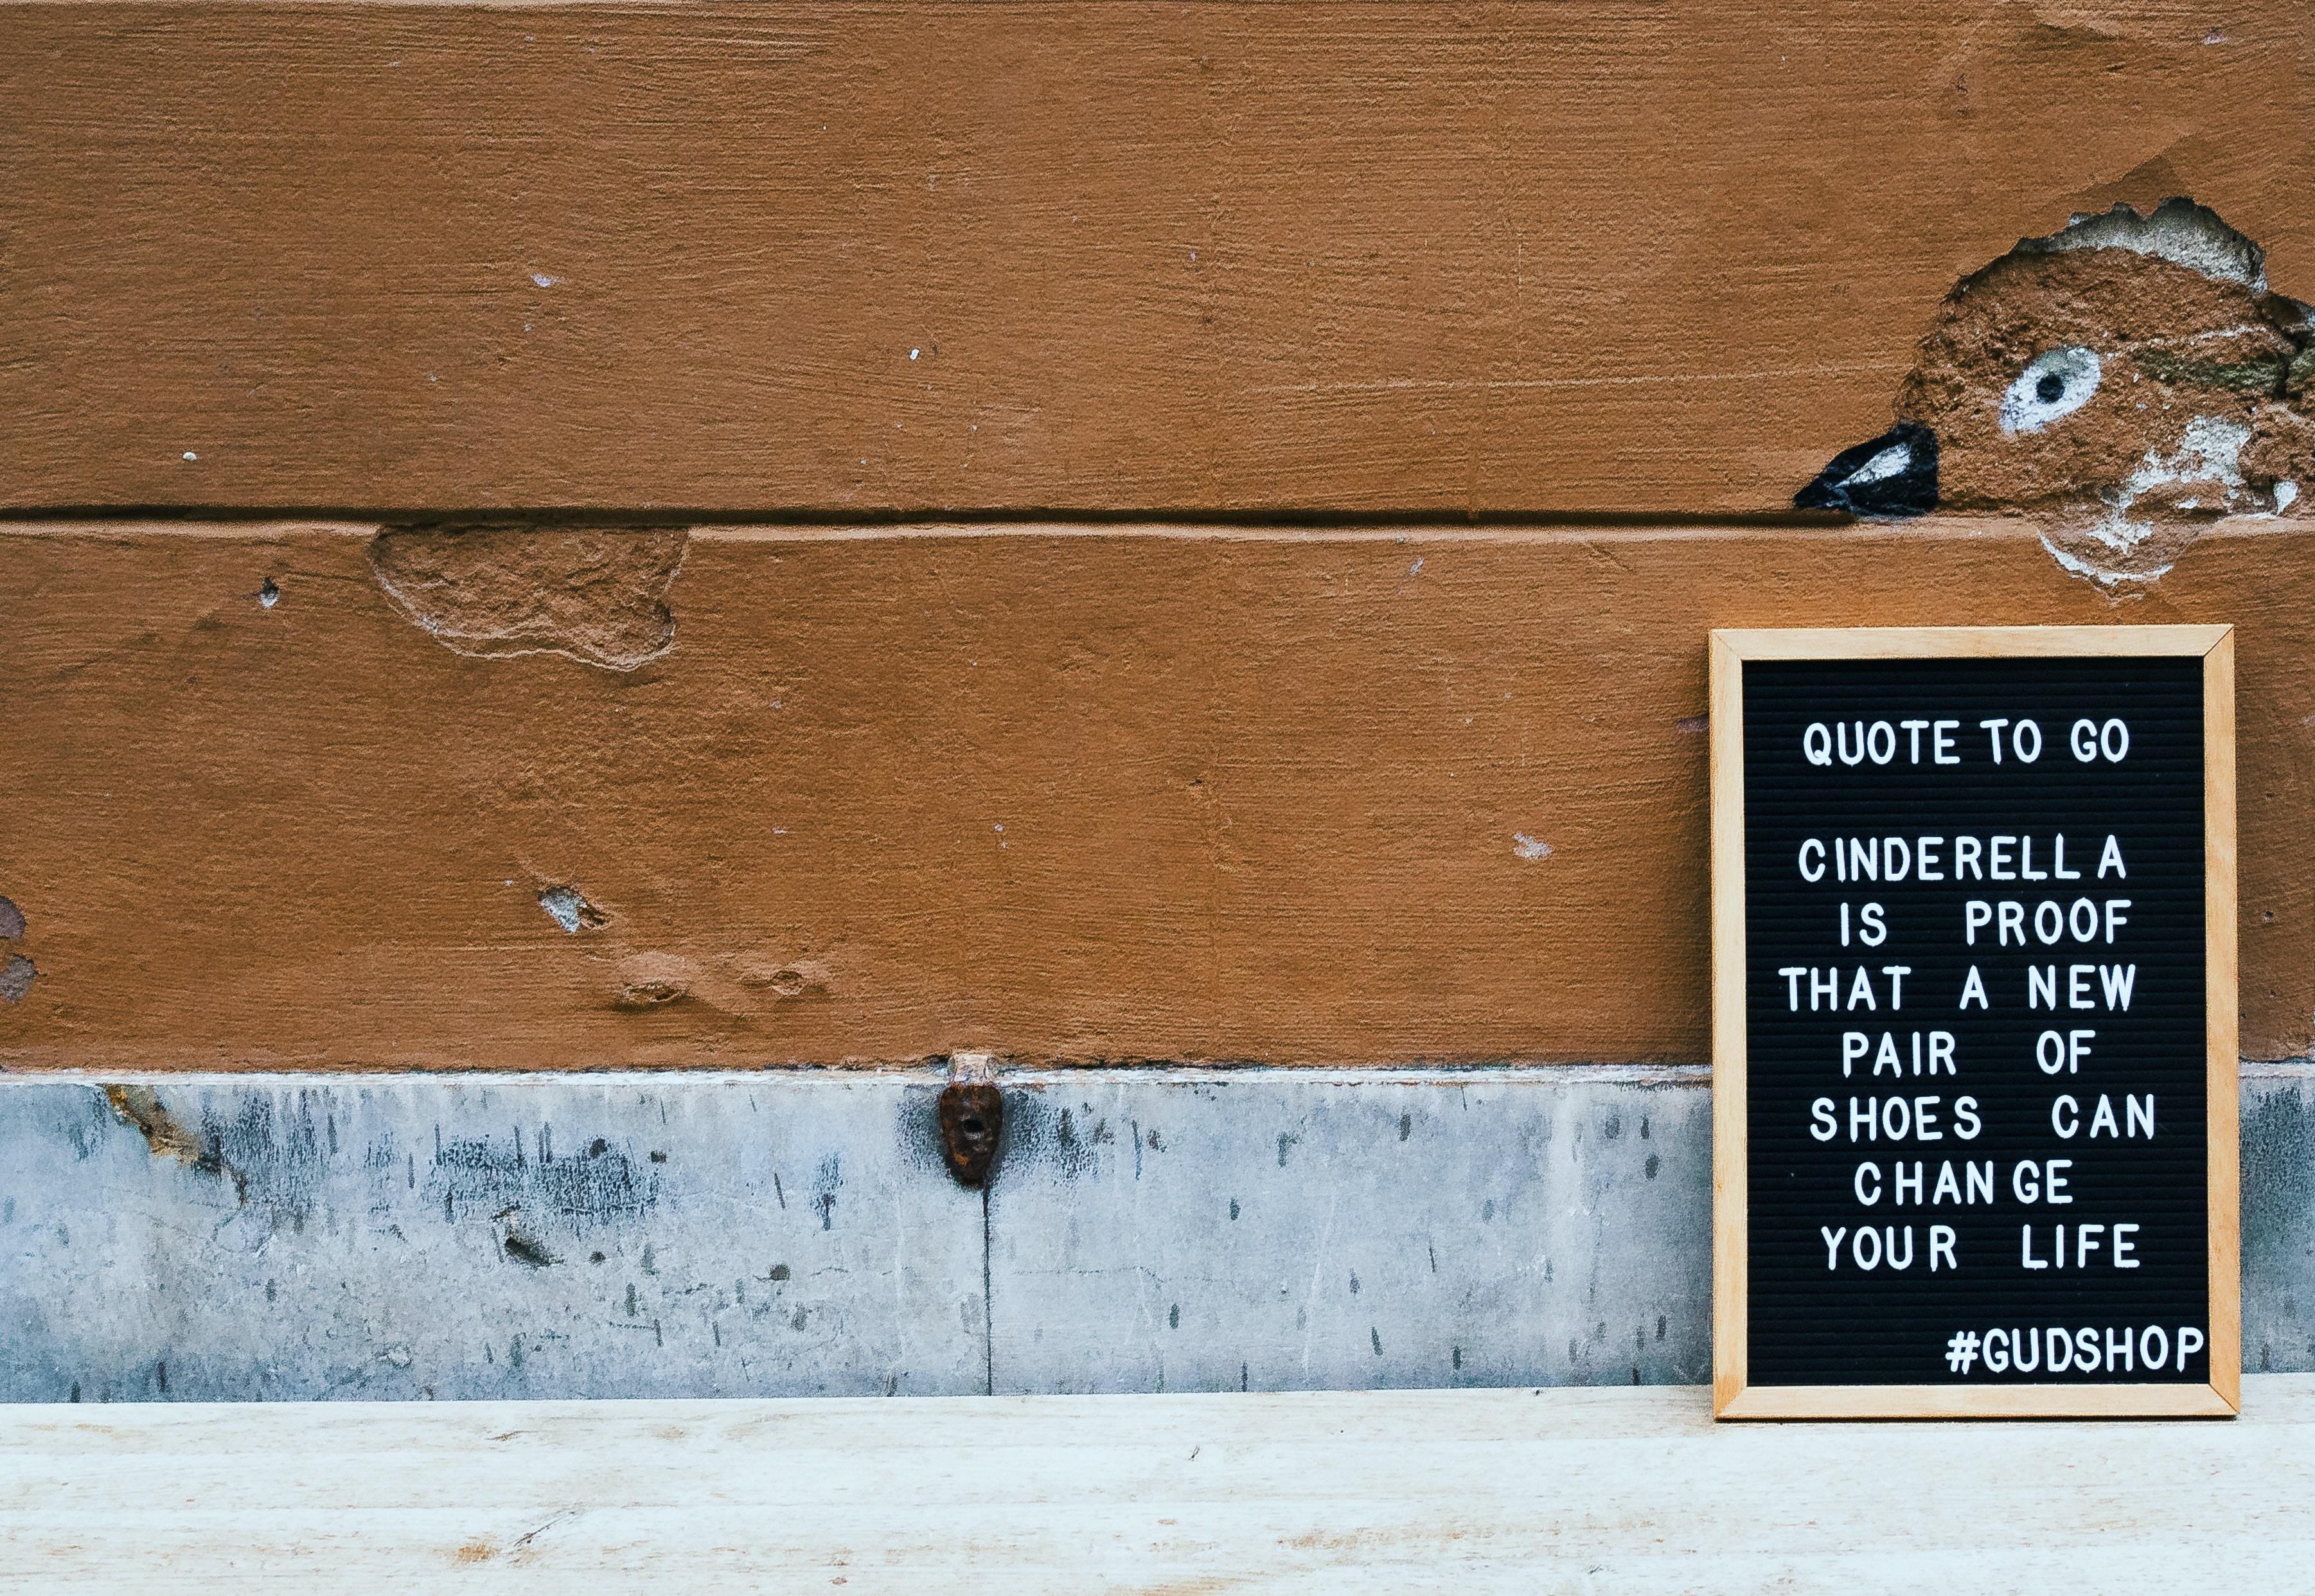 chalkboard leaning on brown concrete wall